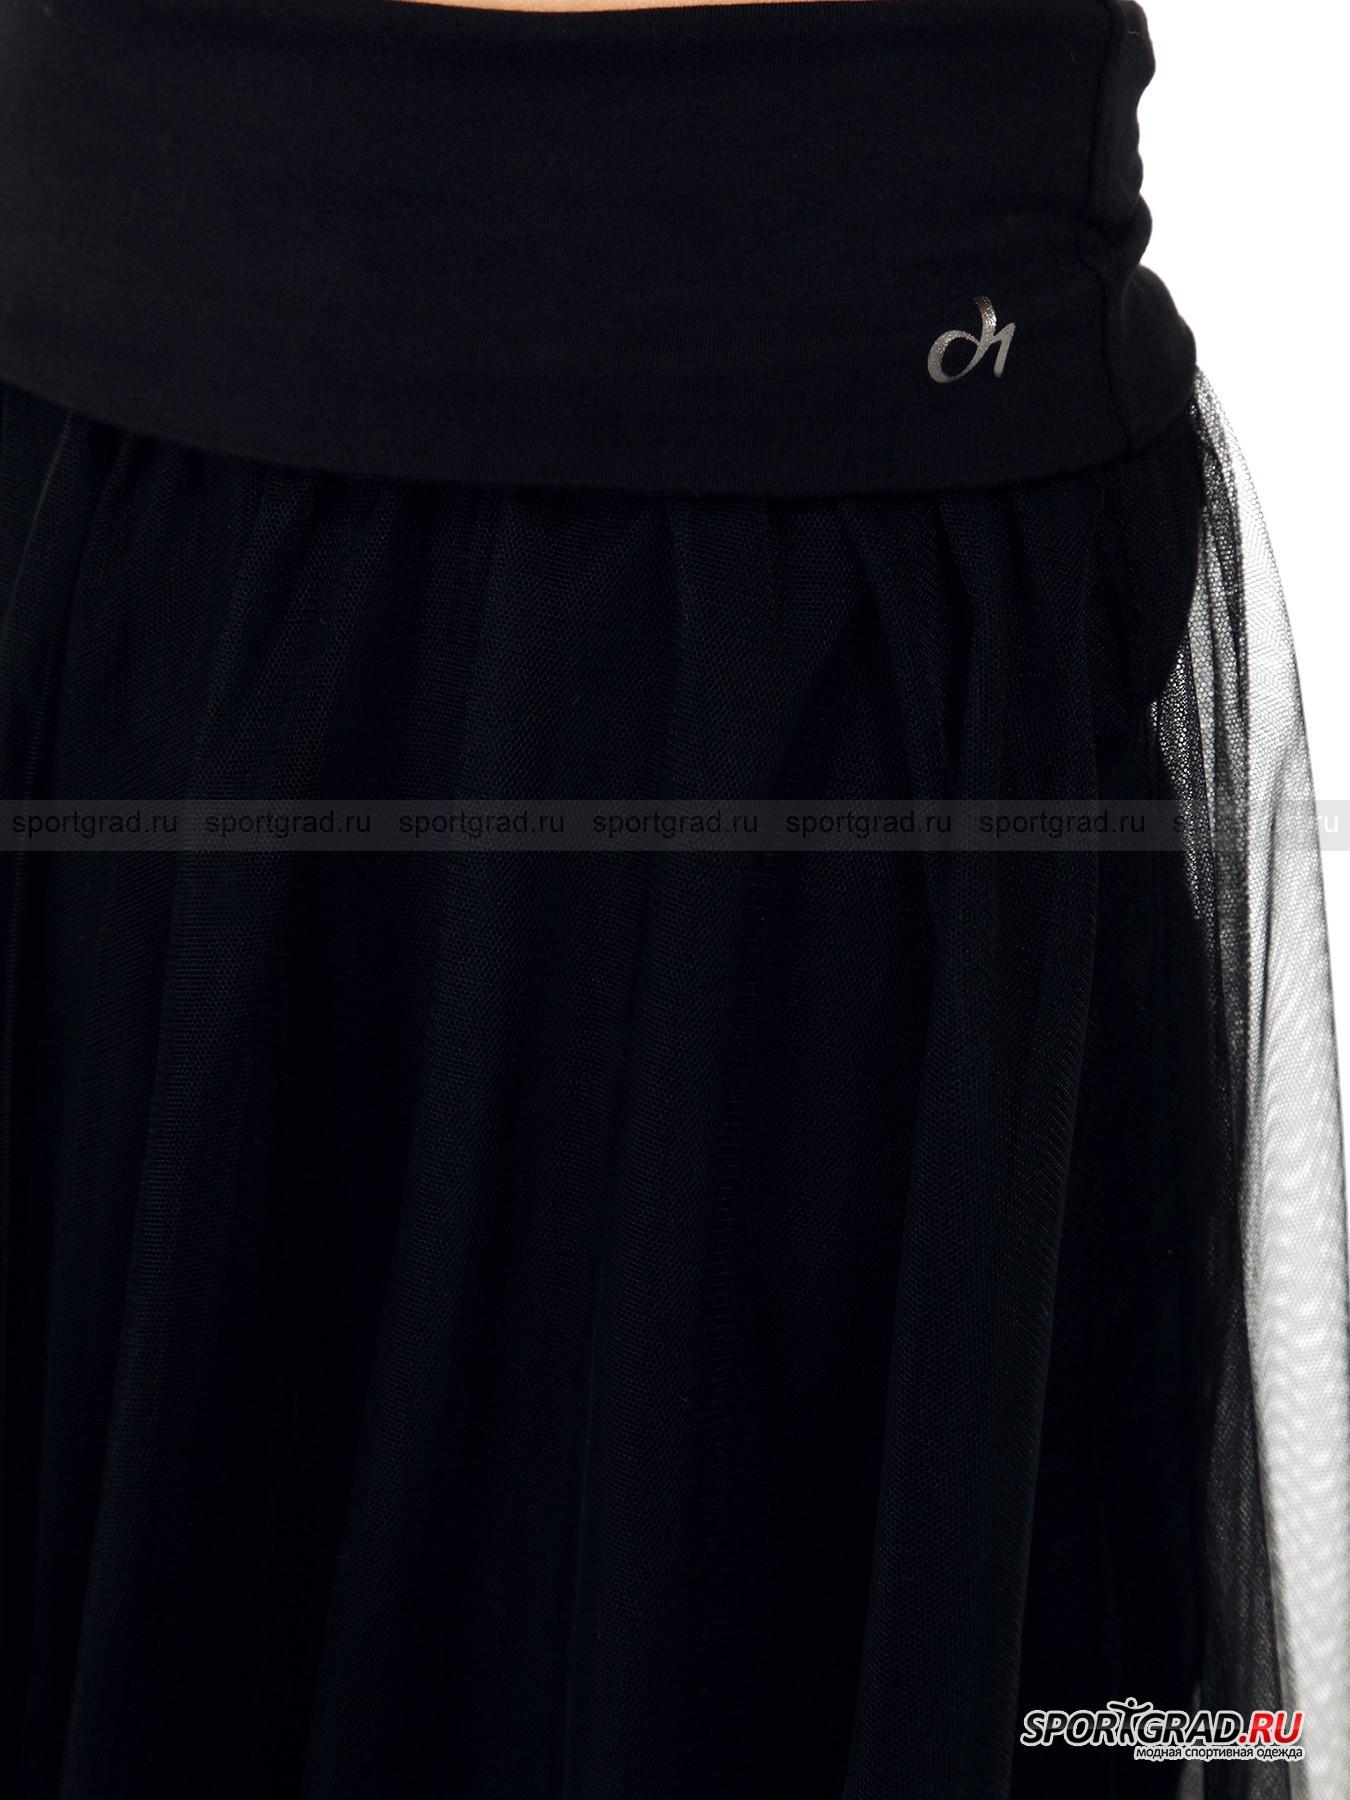 Юбка женская двухъярусная DEHA от Спортград